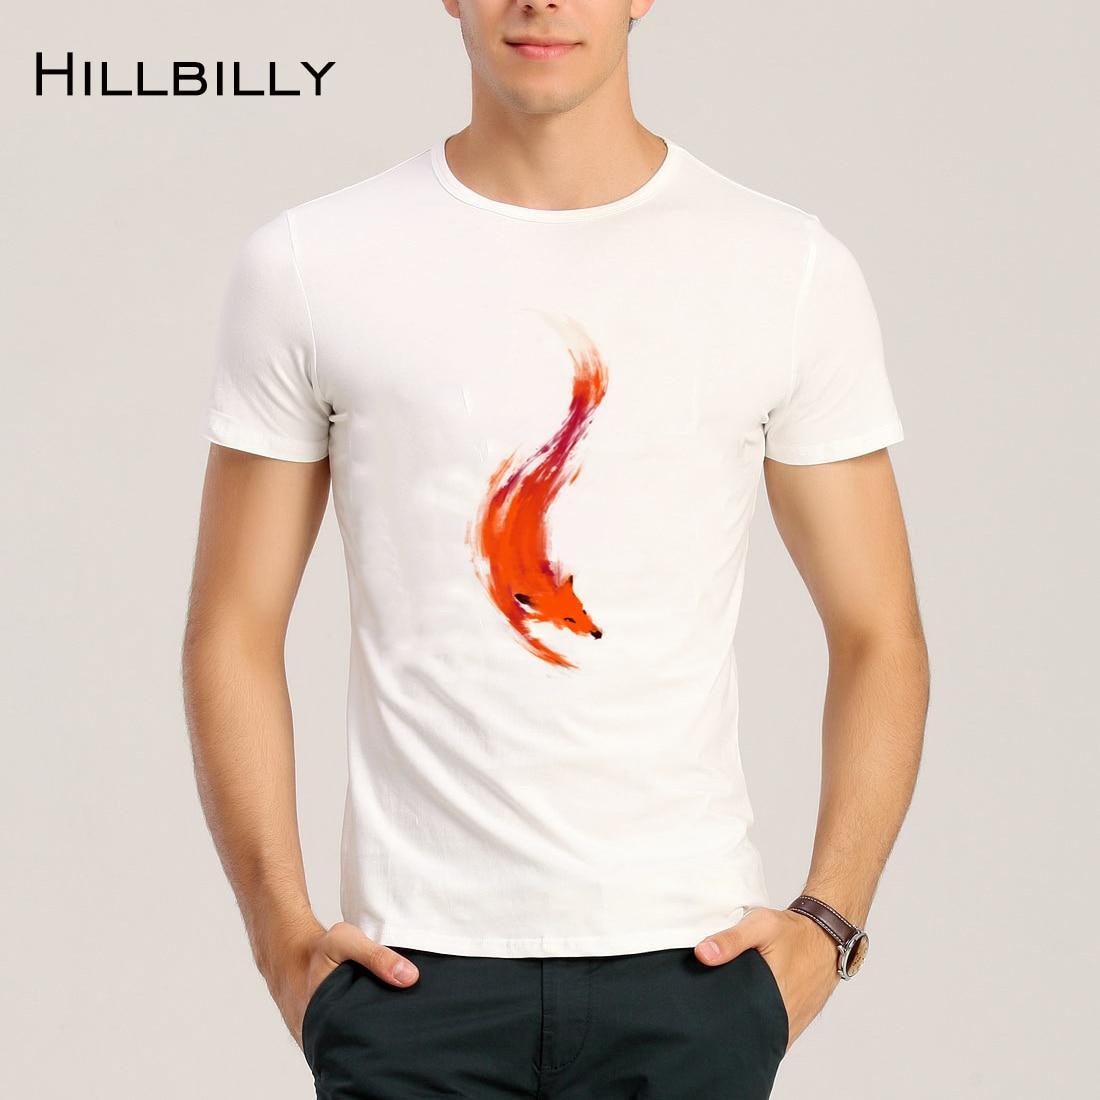 2017 Hillbilly Man Summer New Fashion Red Fox Printed T shirt Modal O-Neck Broadcloth Man Ordinary Casual T-shirt Street Wear